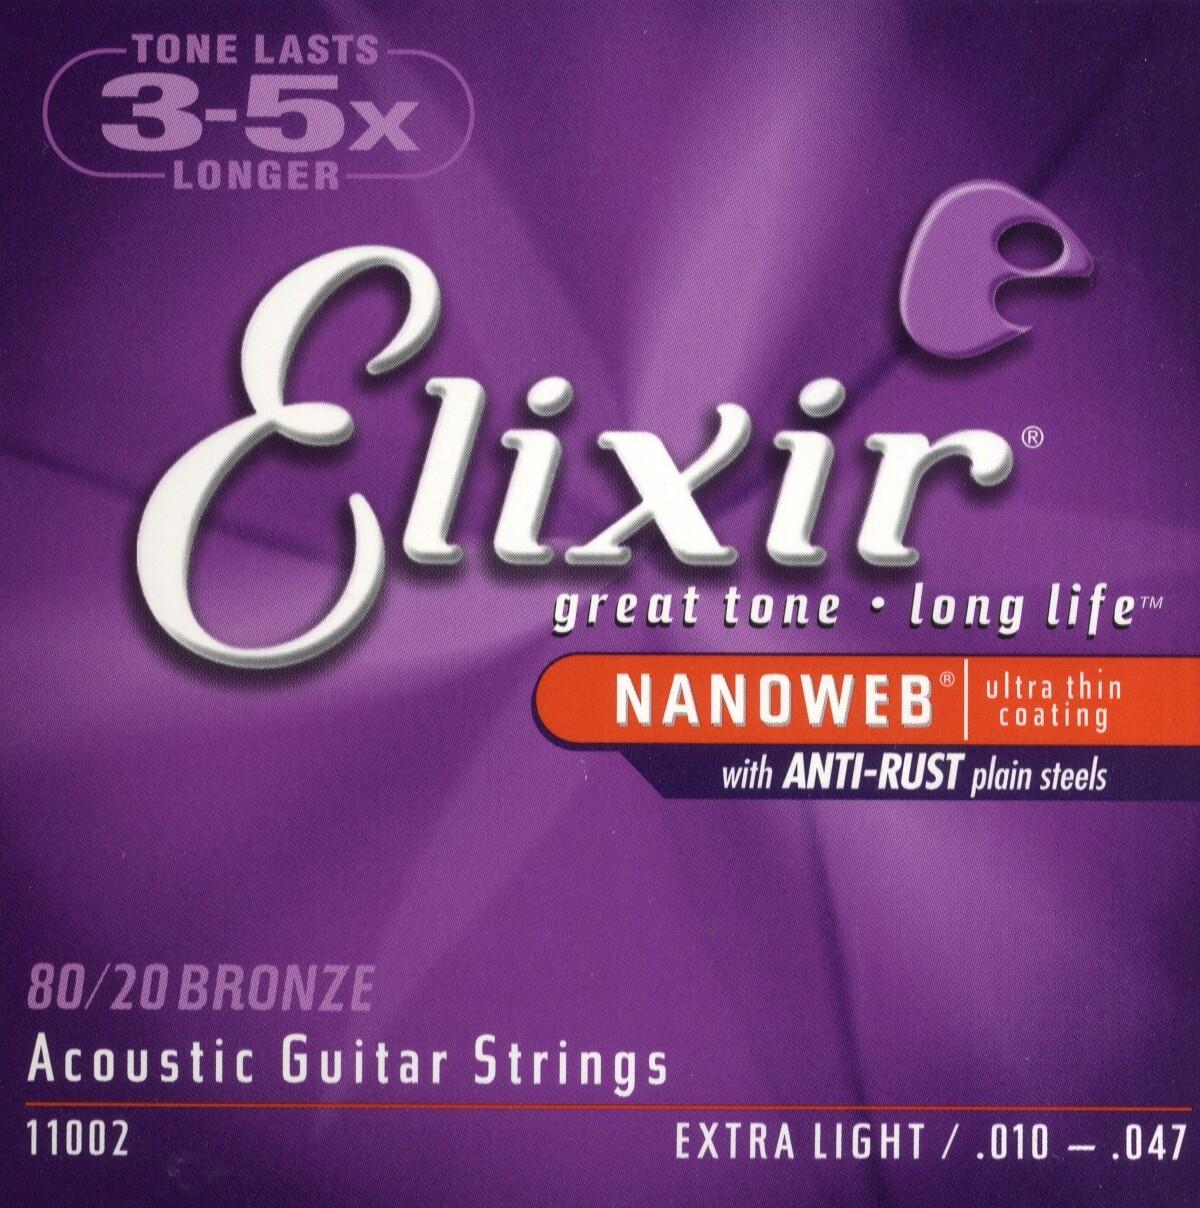 Nanoweb Acoustic Guitar Strings X Light 010-047: Strings